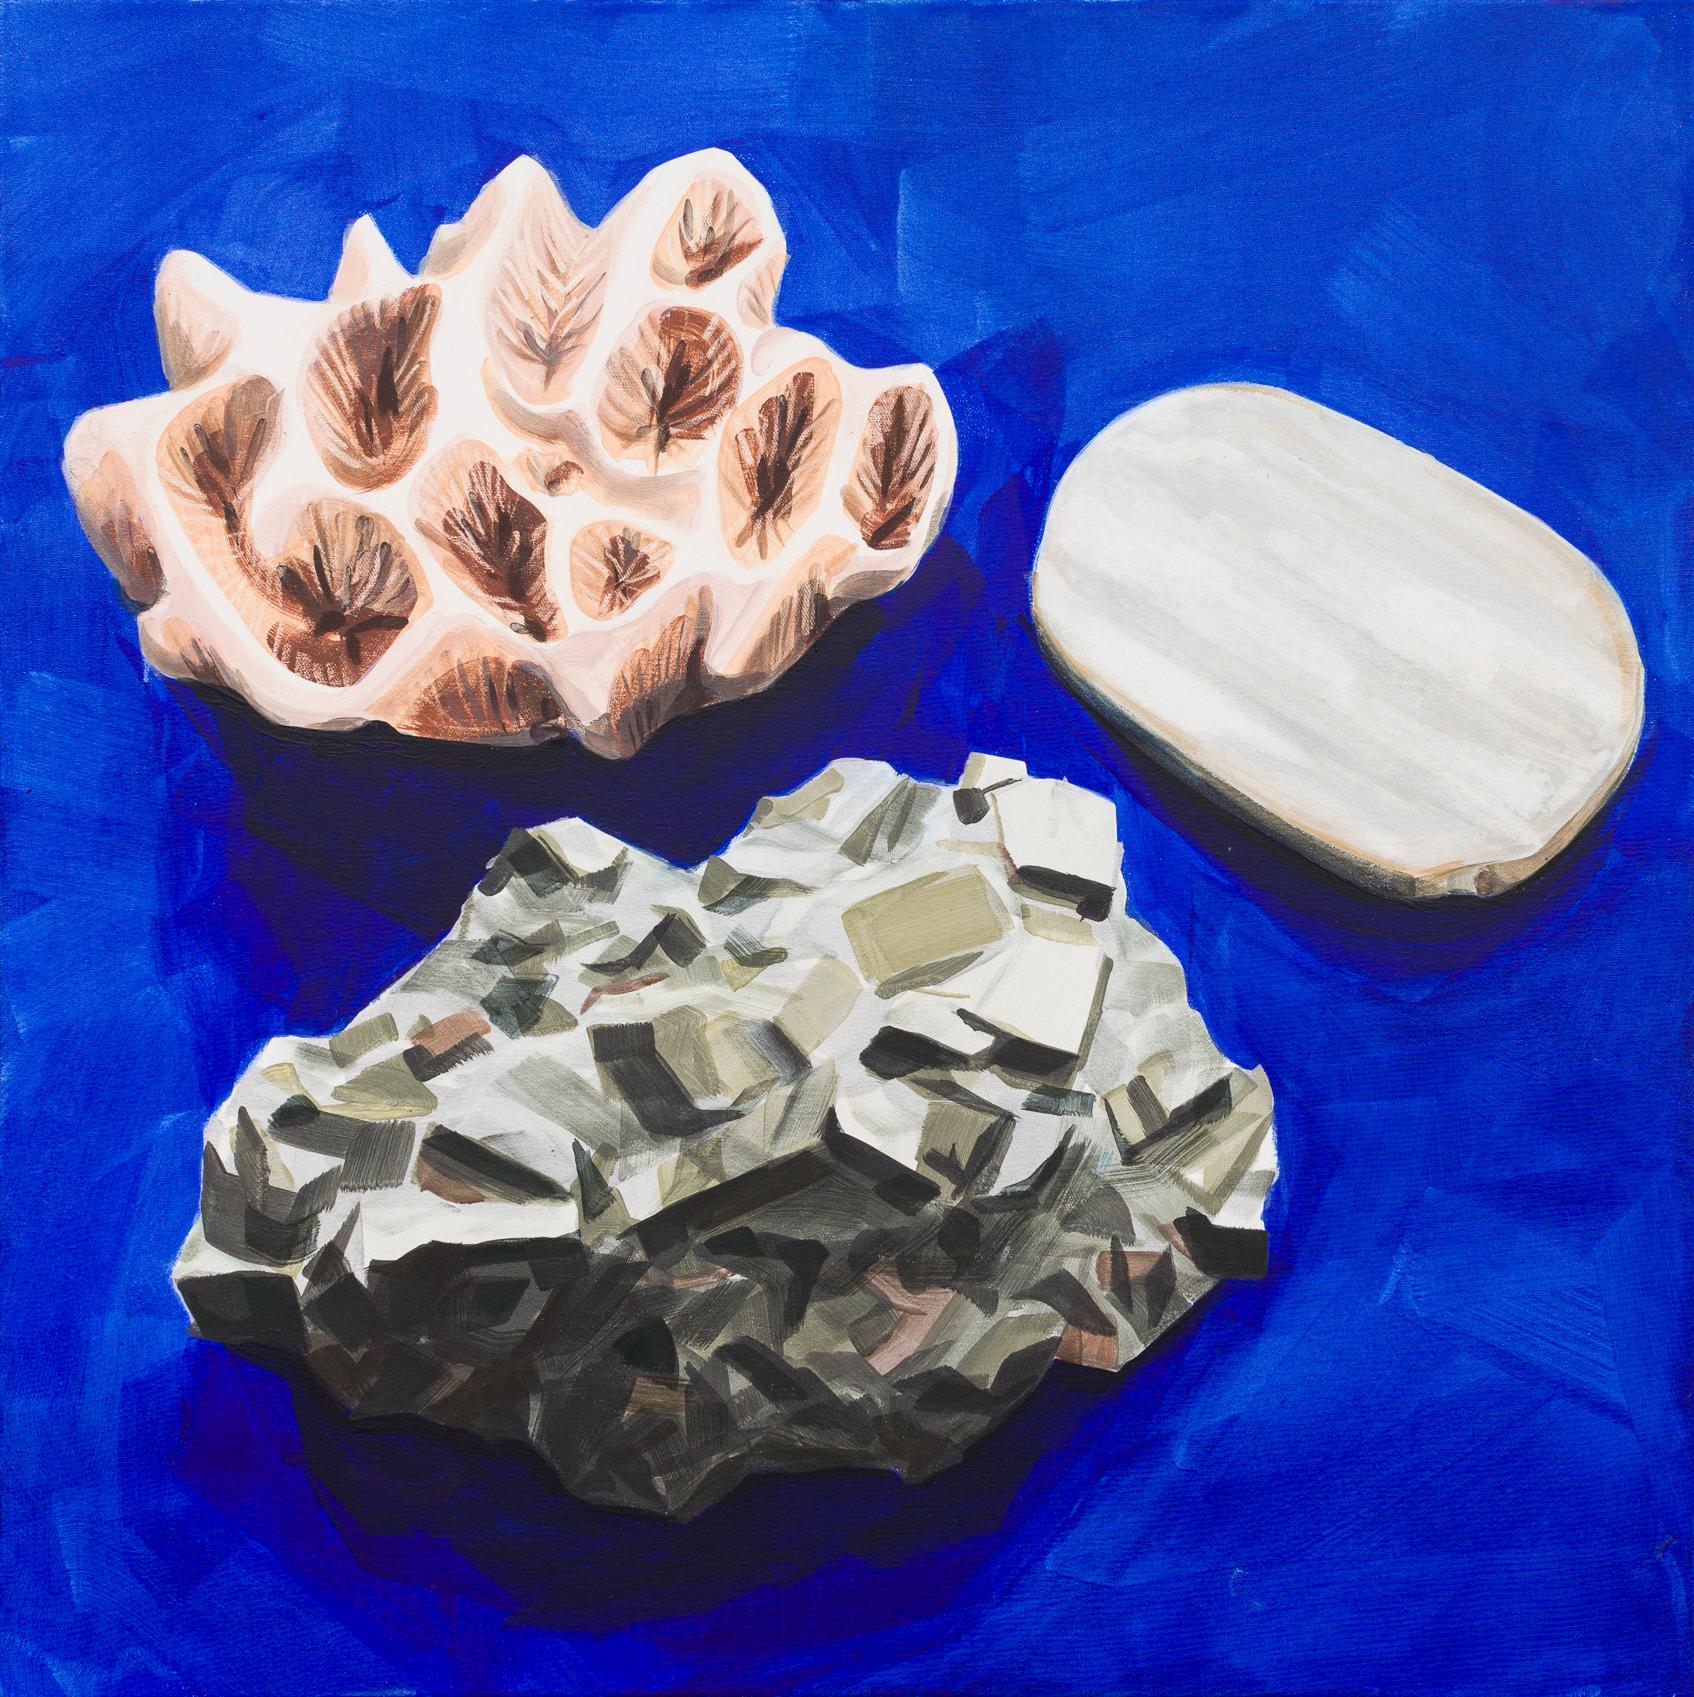 Britt Dorenbosch het-stenenmuseum